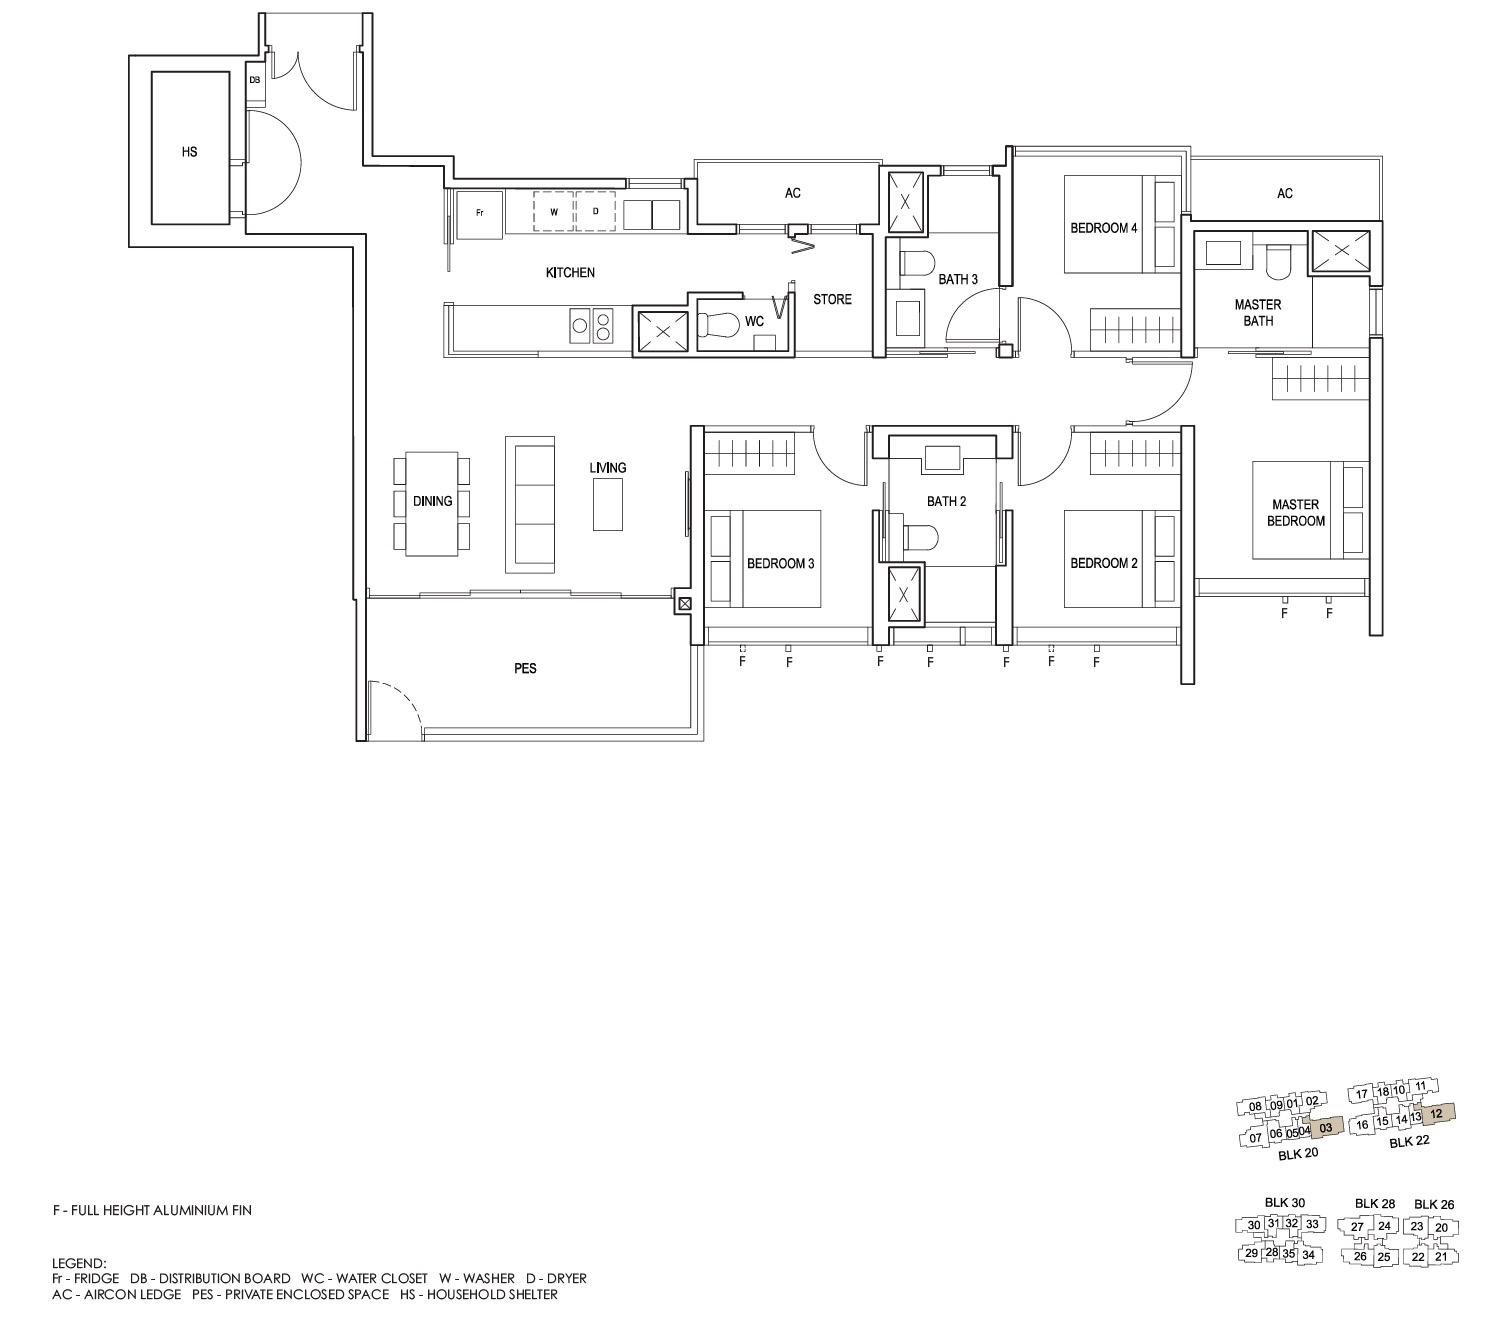 penrose-sims-floorplan 4BR